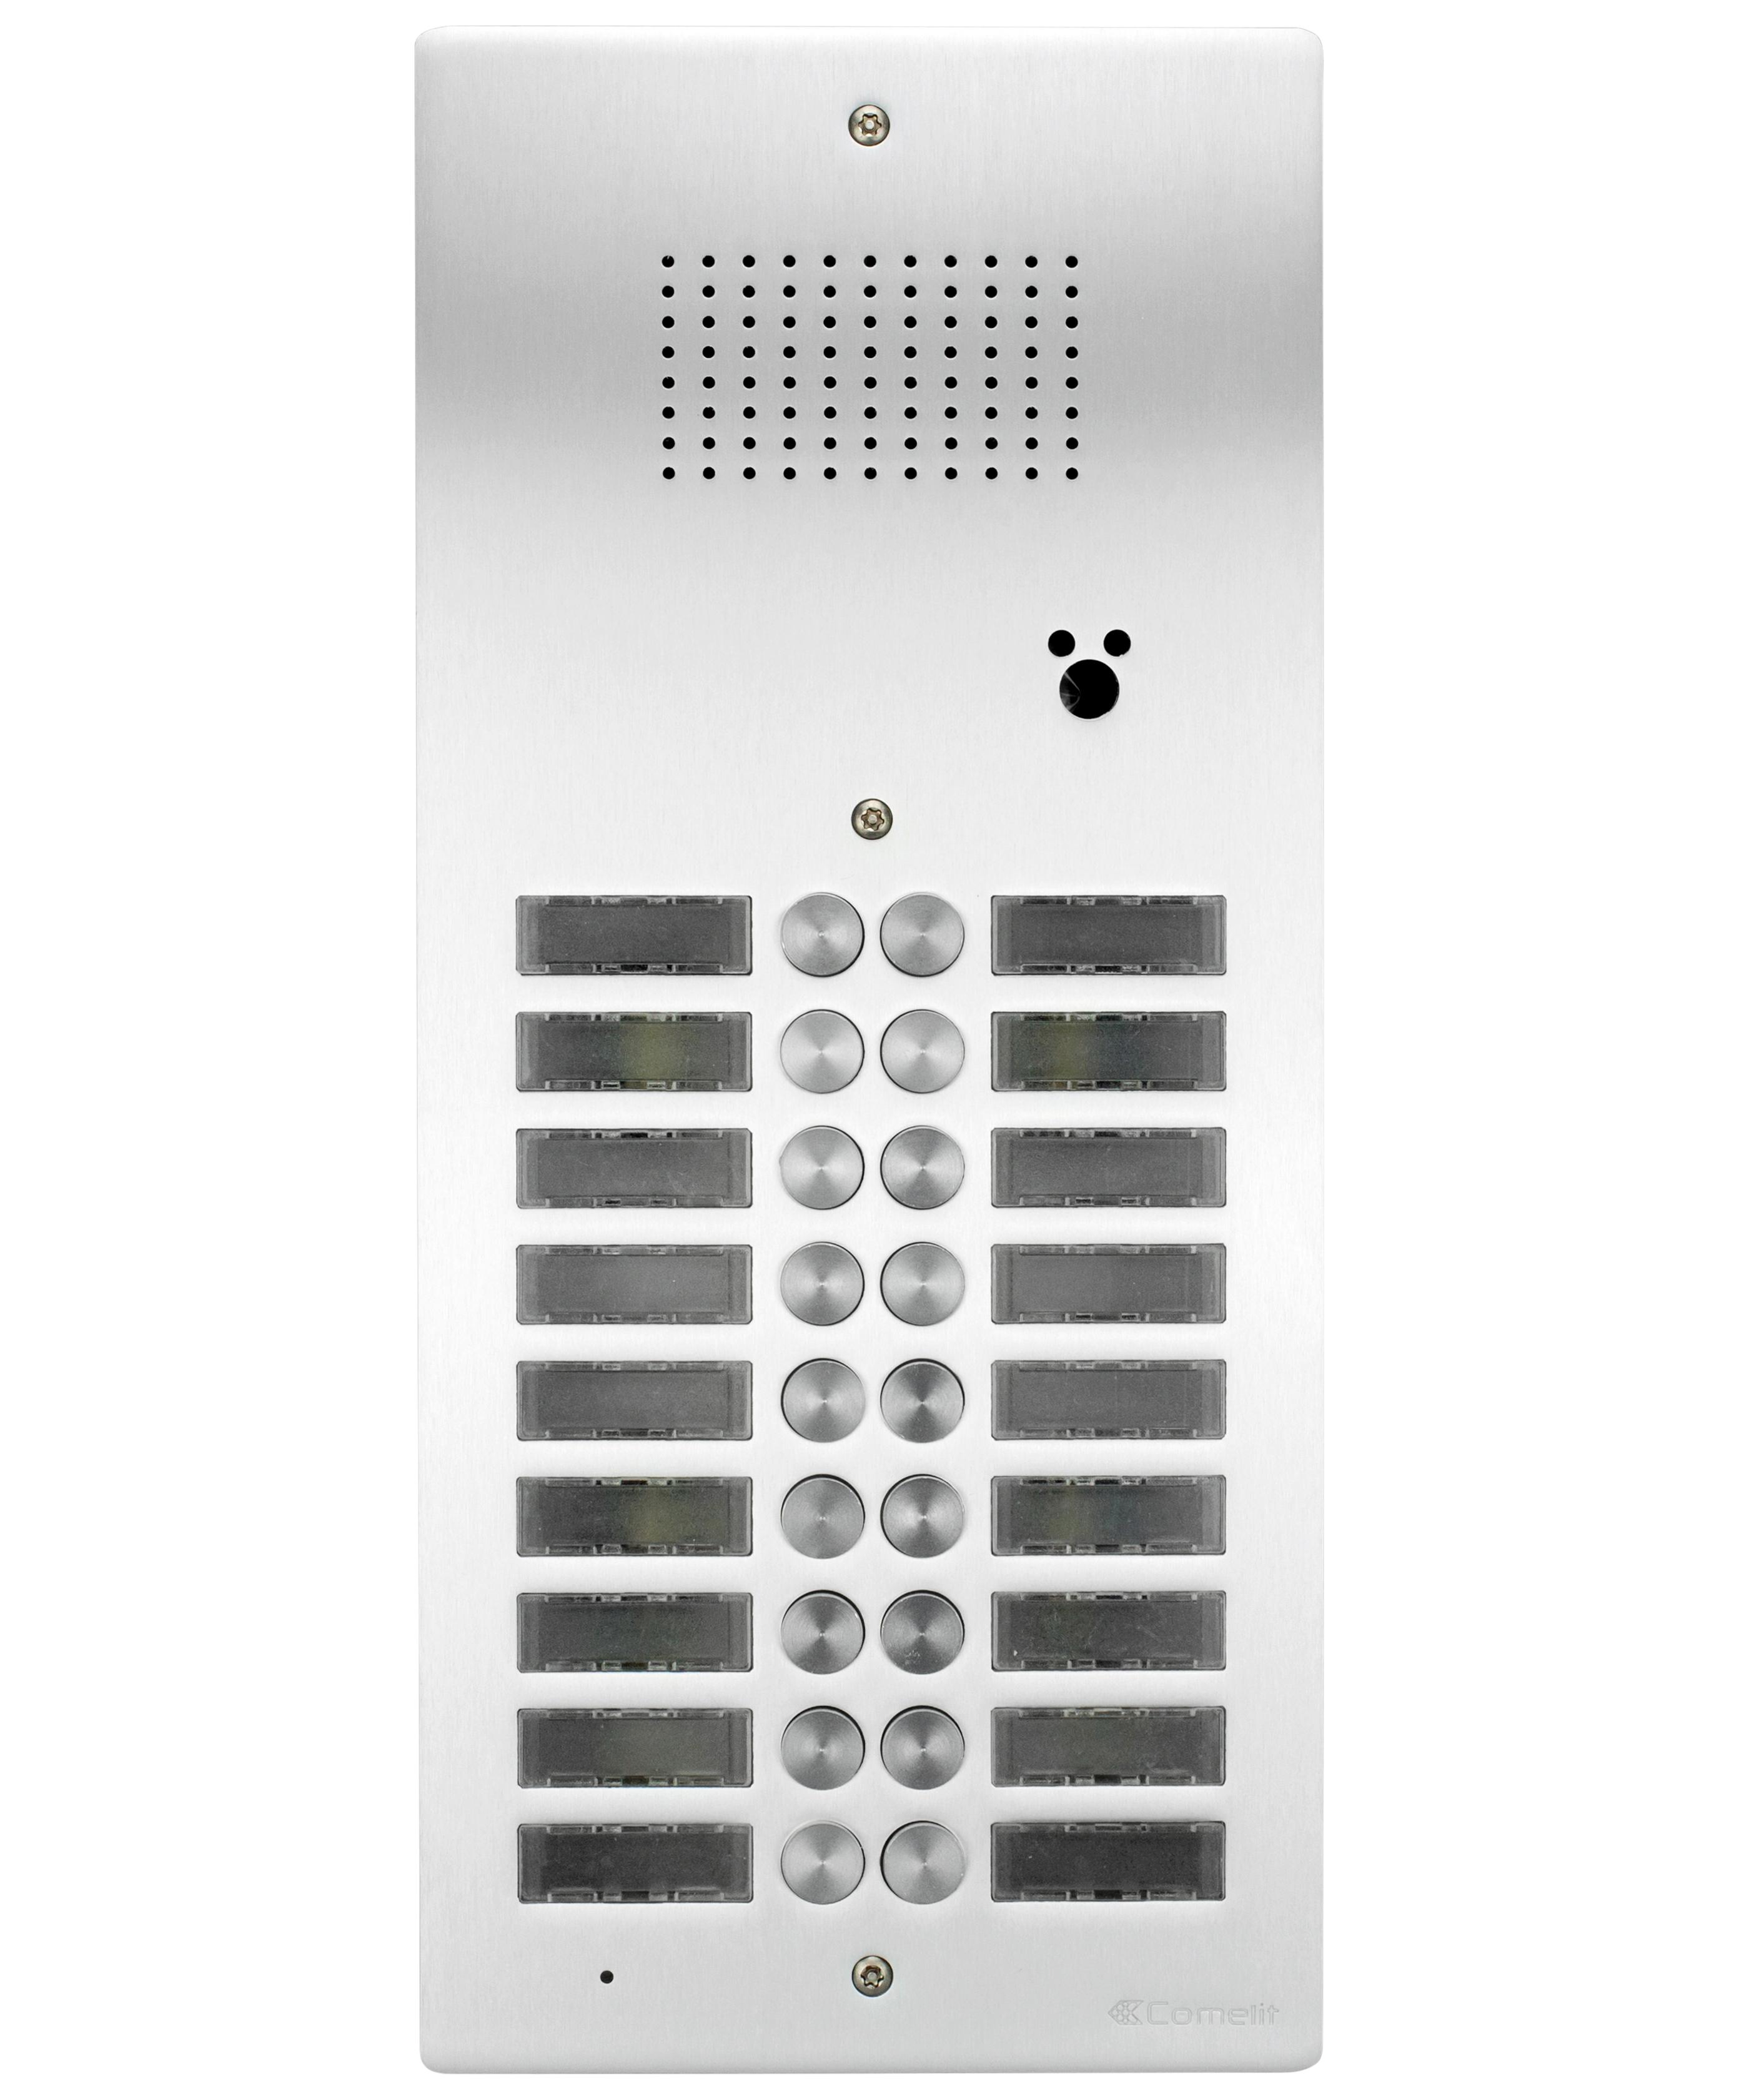 1 Stk AV-Panel Audio, 16 Tasten mit Postschloss-Ausschnitt, Alu SP3016NAPT